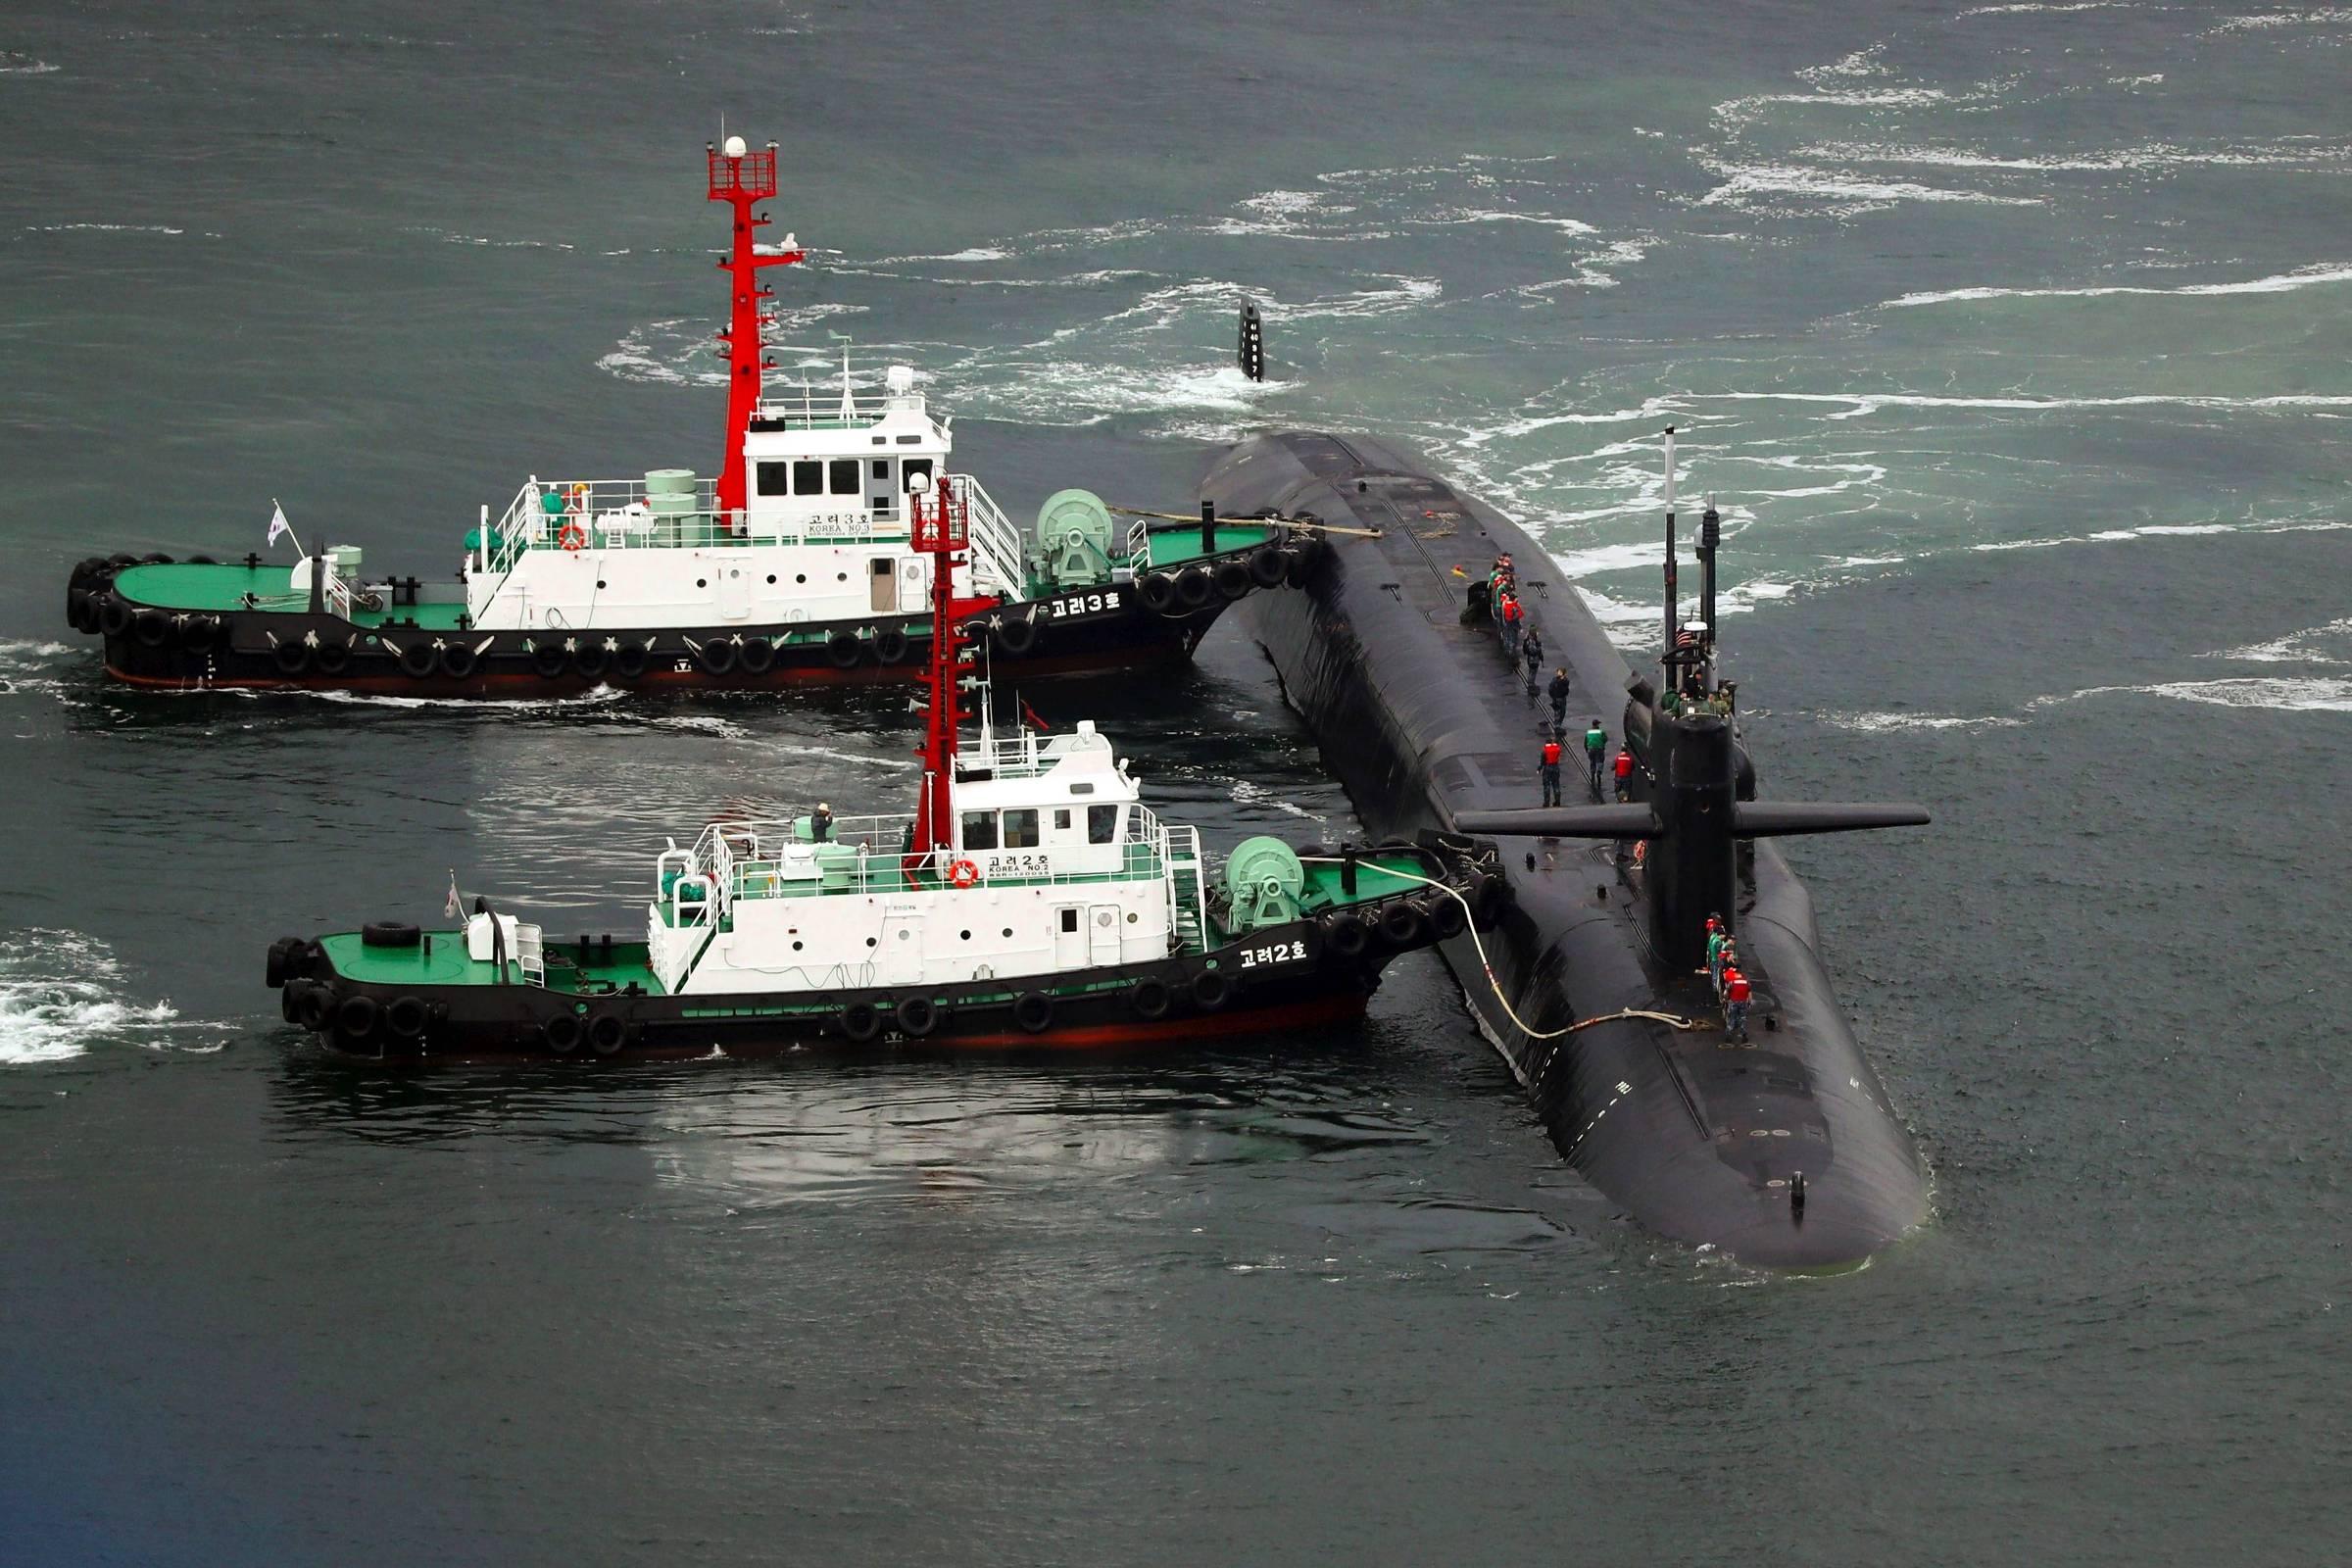 Acordo militar de submarinos irá impactar regras de armas nucleares